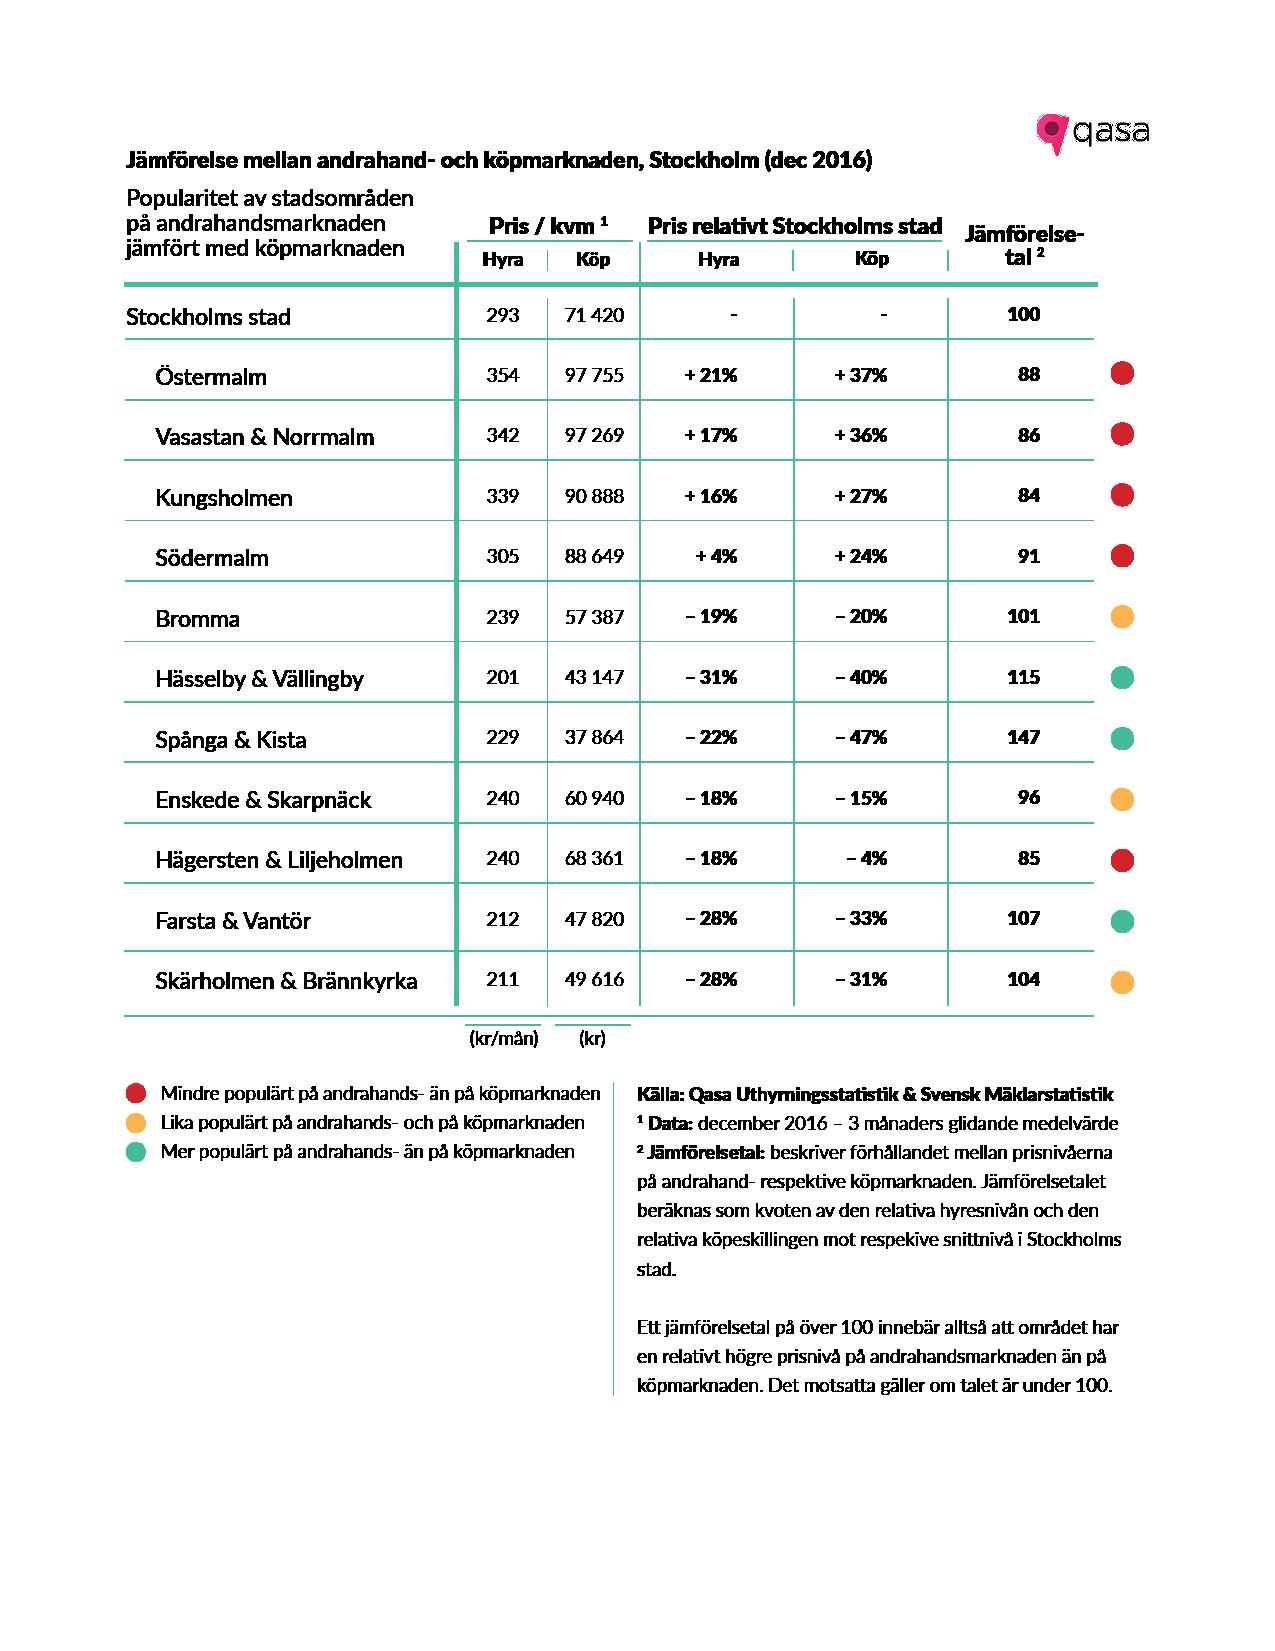 1. Tabell Stockholms Hyresrapport - Jämförelsetal (Stockholms stad)